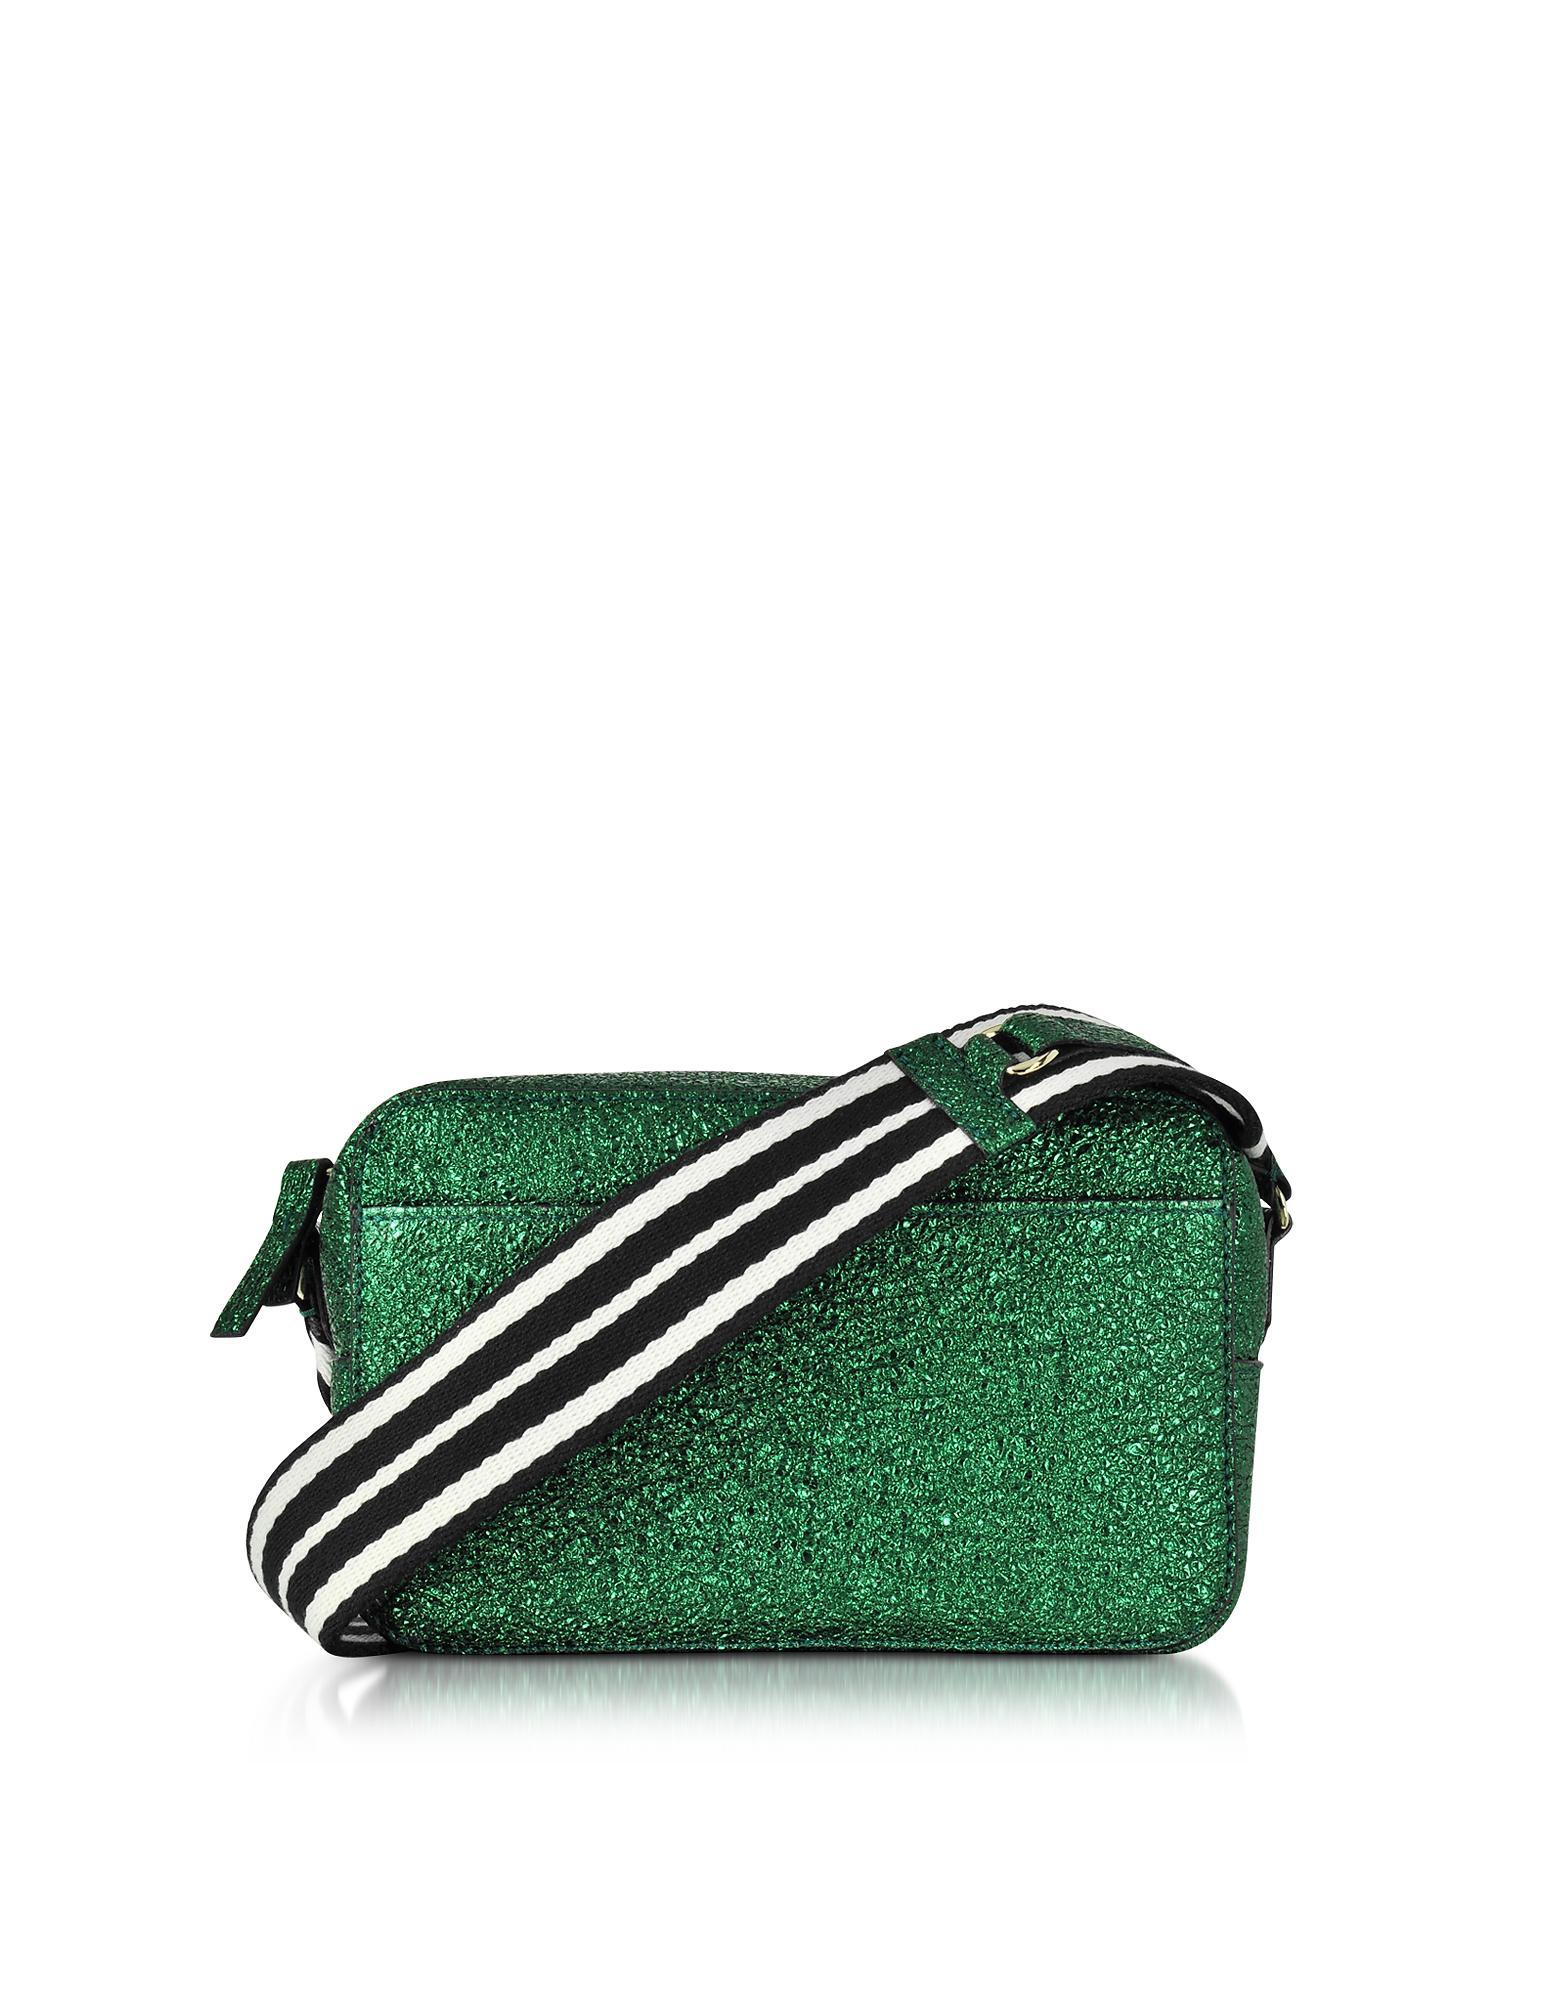 Red Valentino Dark Green Crackled Metallic Leather Crossbody Bag W Striped  Canvas Strap db7ca5f978c58